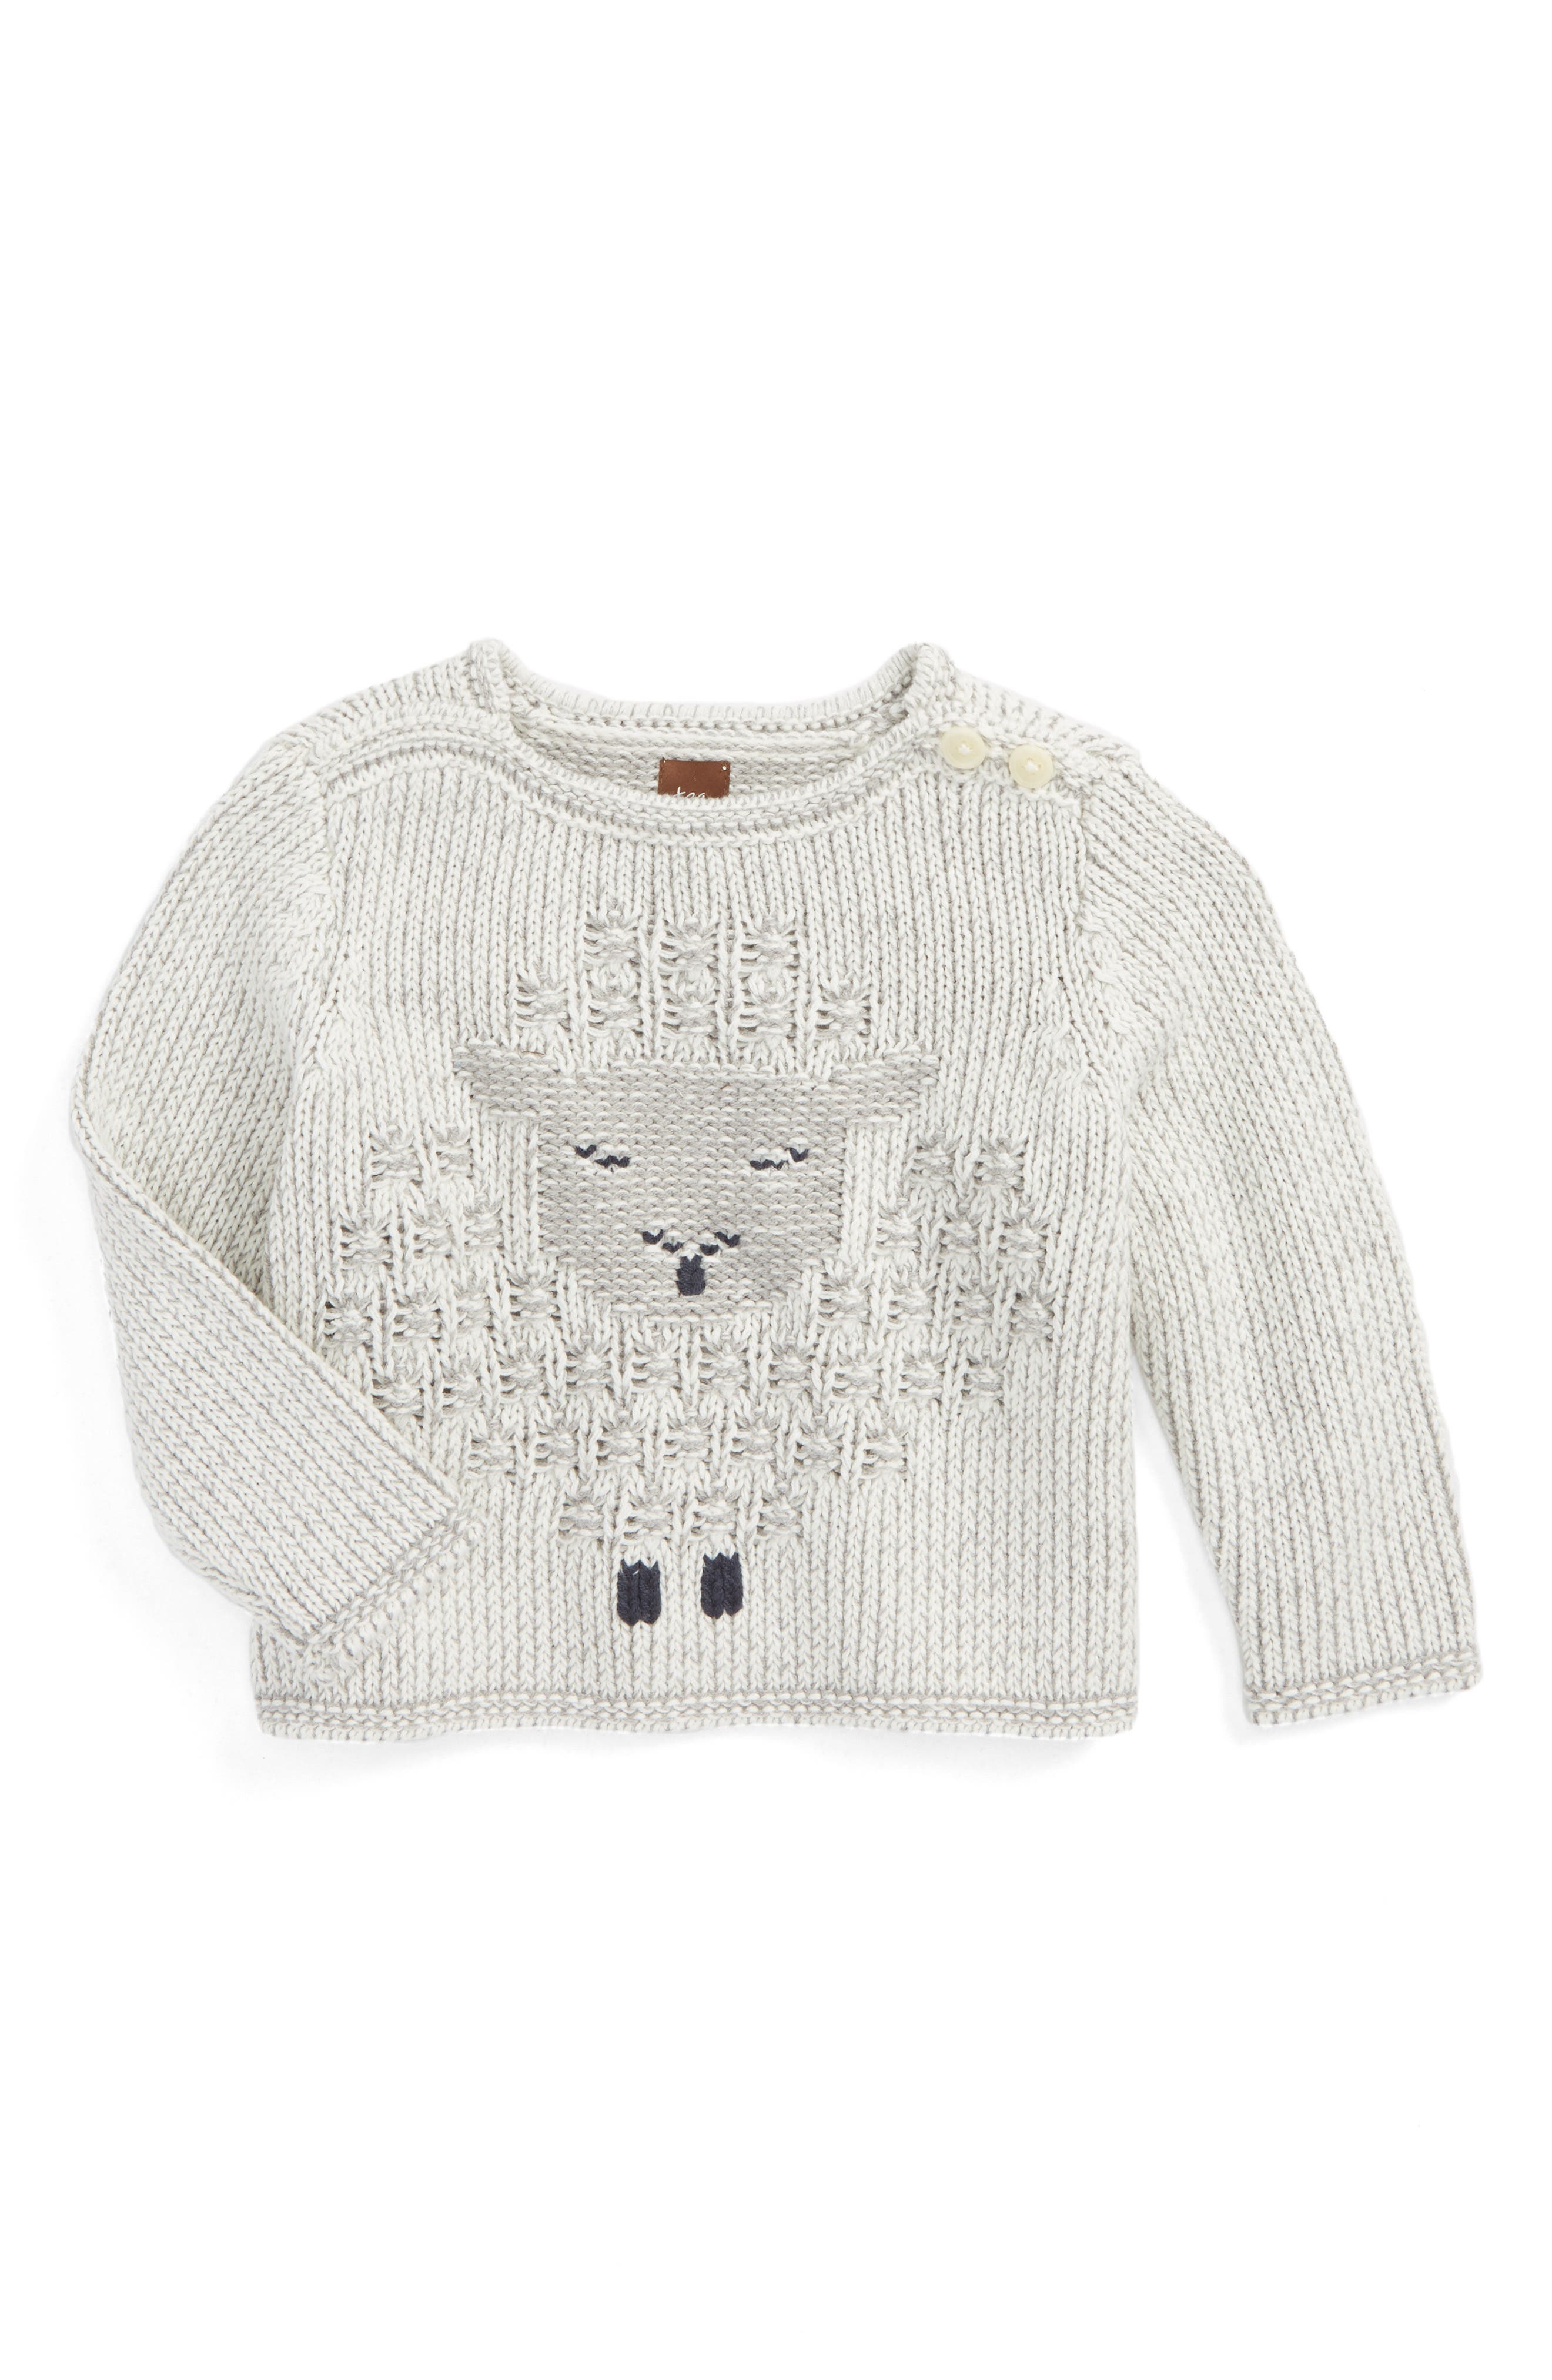 Uan Sweater,                         Main,                         color, 103